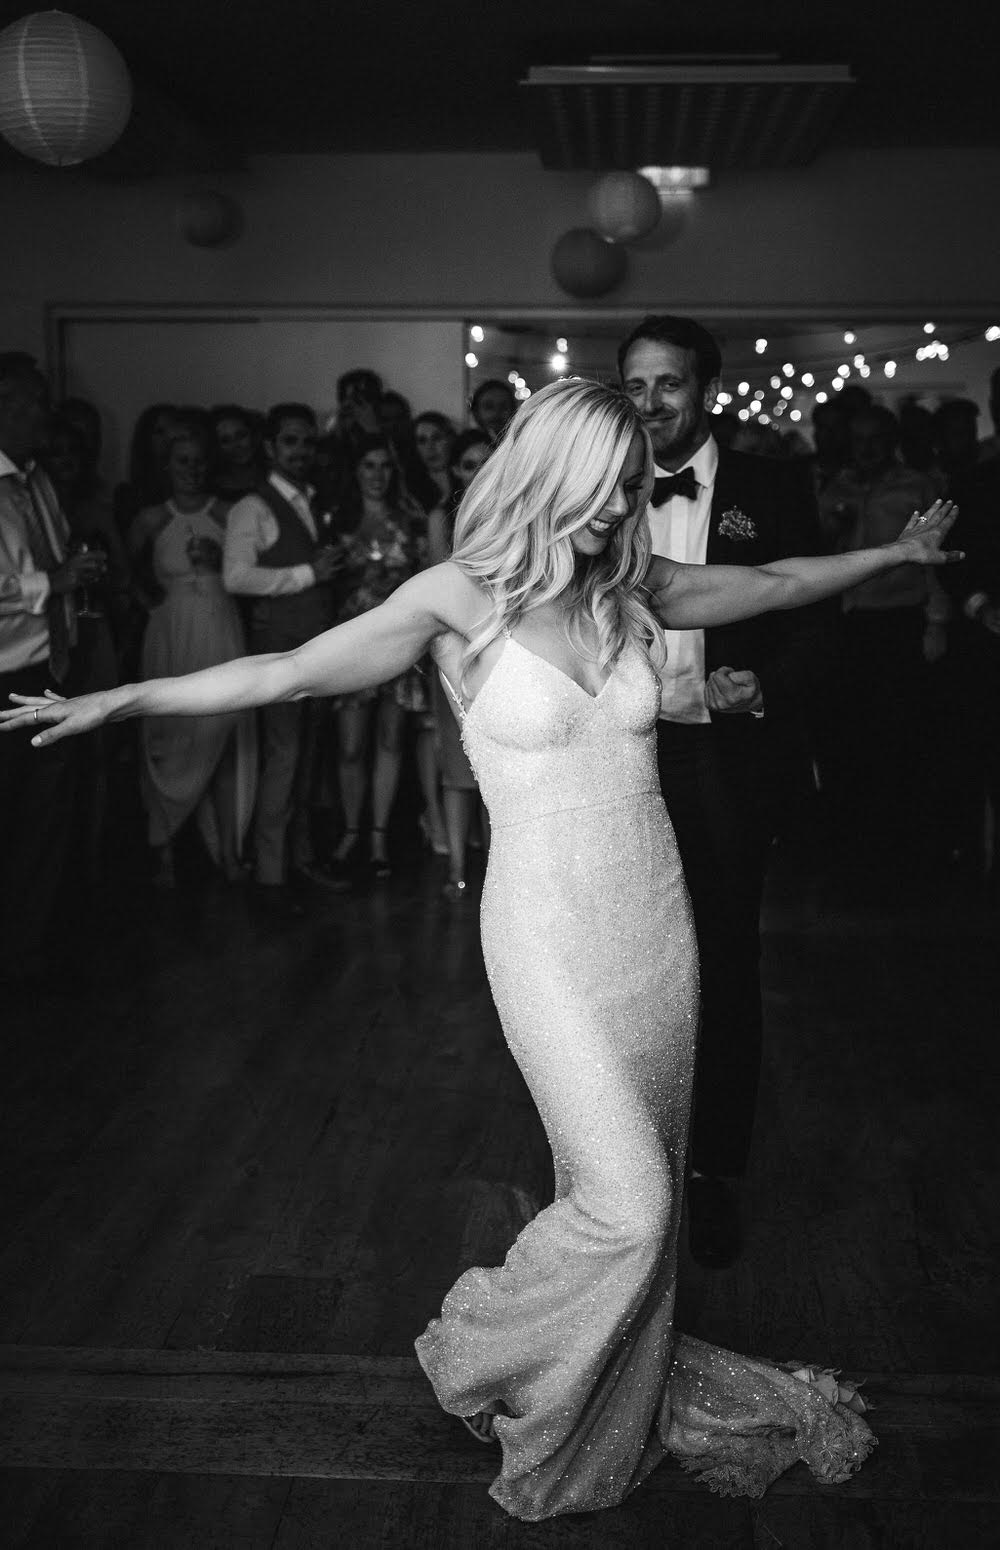 Bespoke Bridalwear And Wedding Accessories By Julita LDN Bride